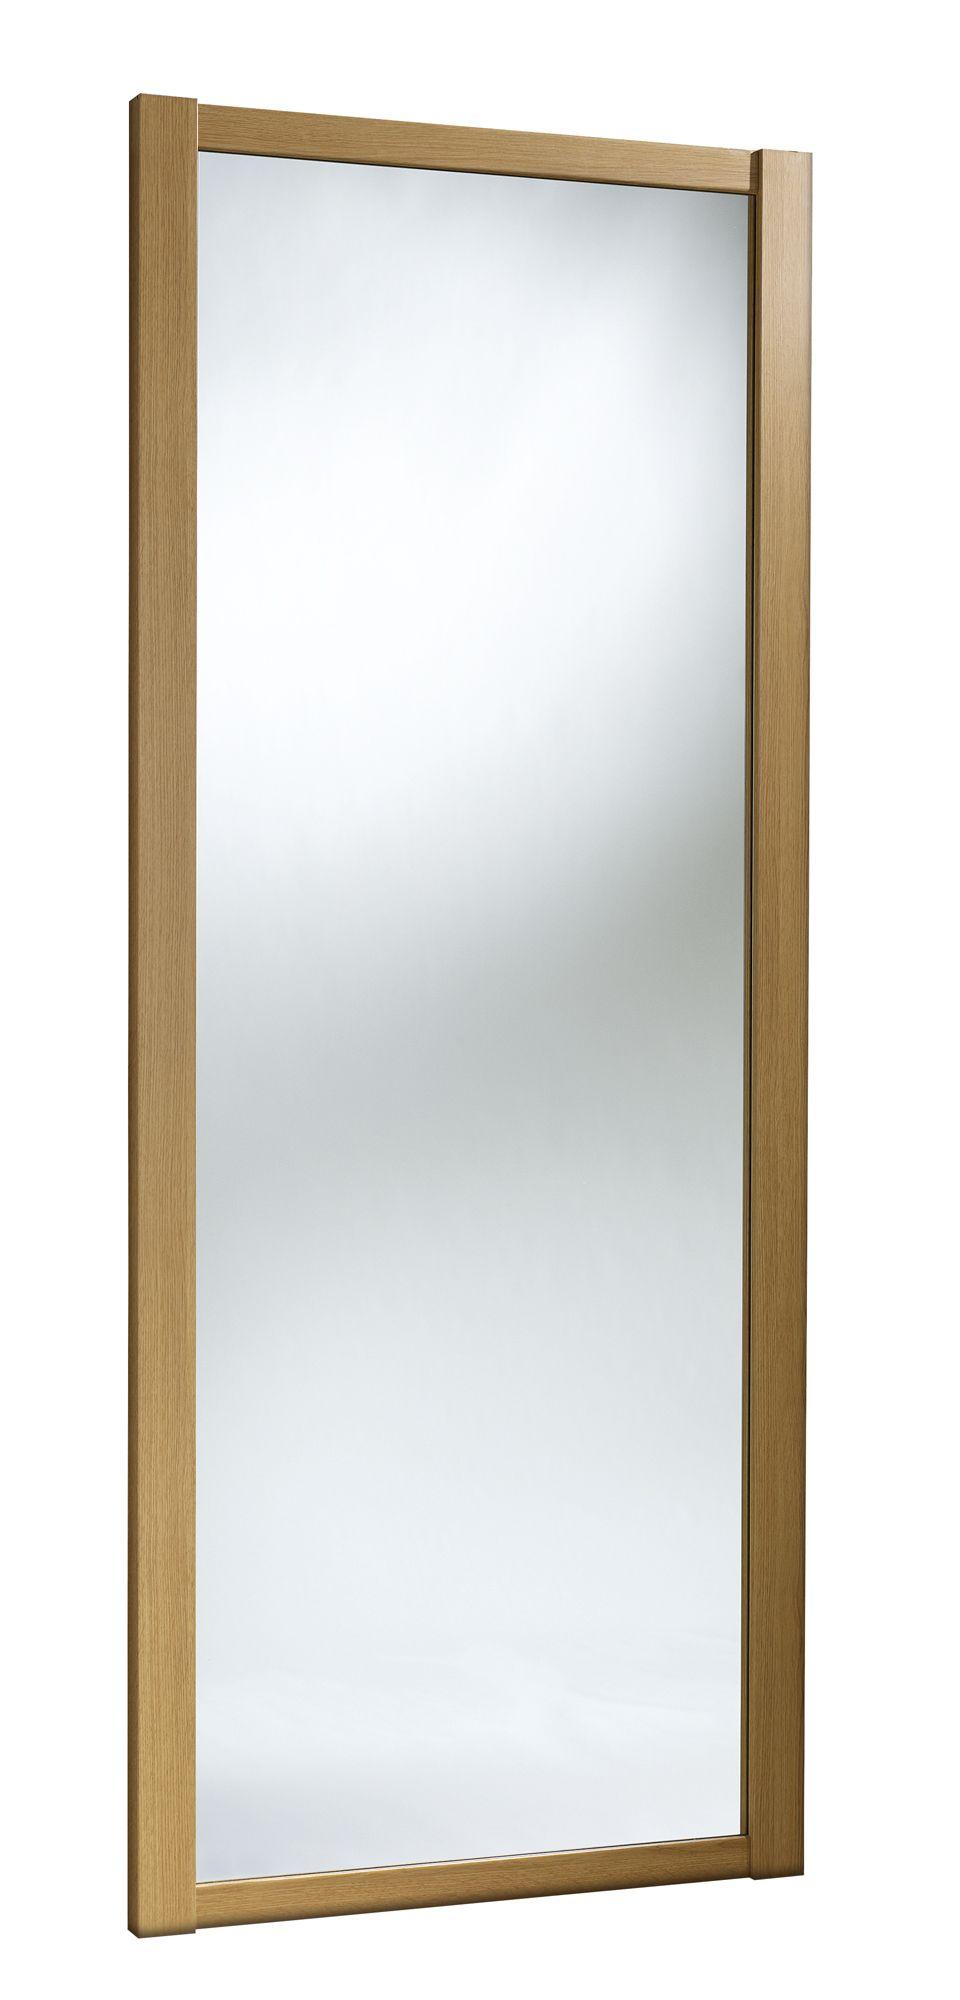 Shaker Full Length Mirror Natural Oak Effect Sliding Wardrobe Door (h)2220 Mm (w)610mm